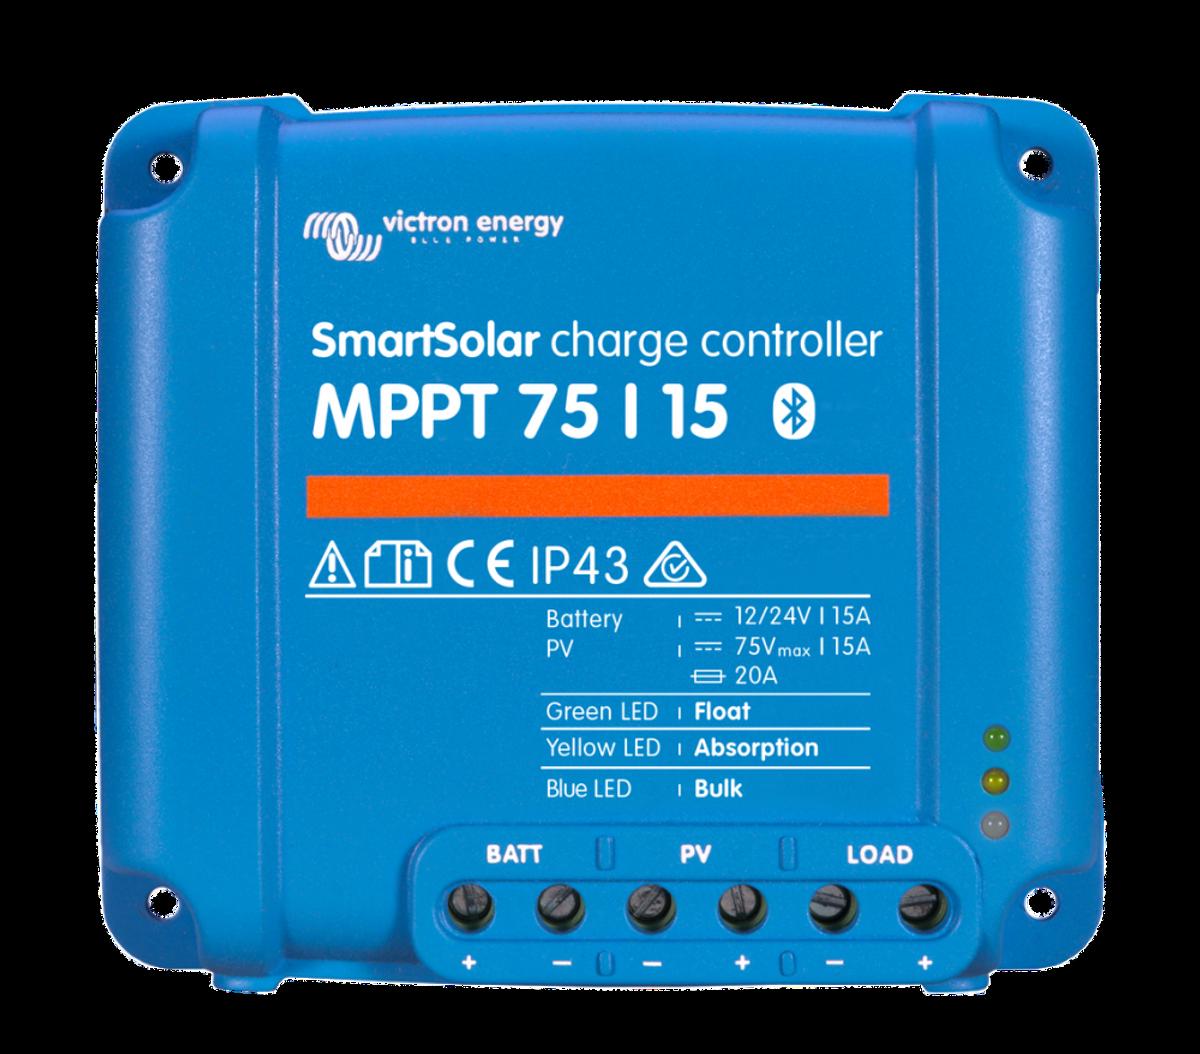 15A Victron SmartSolar MPPT 75/15 blåtann